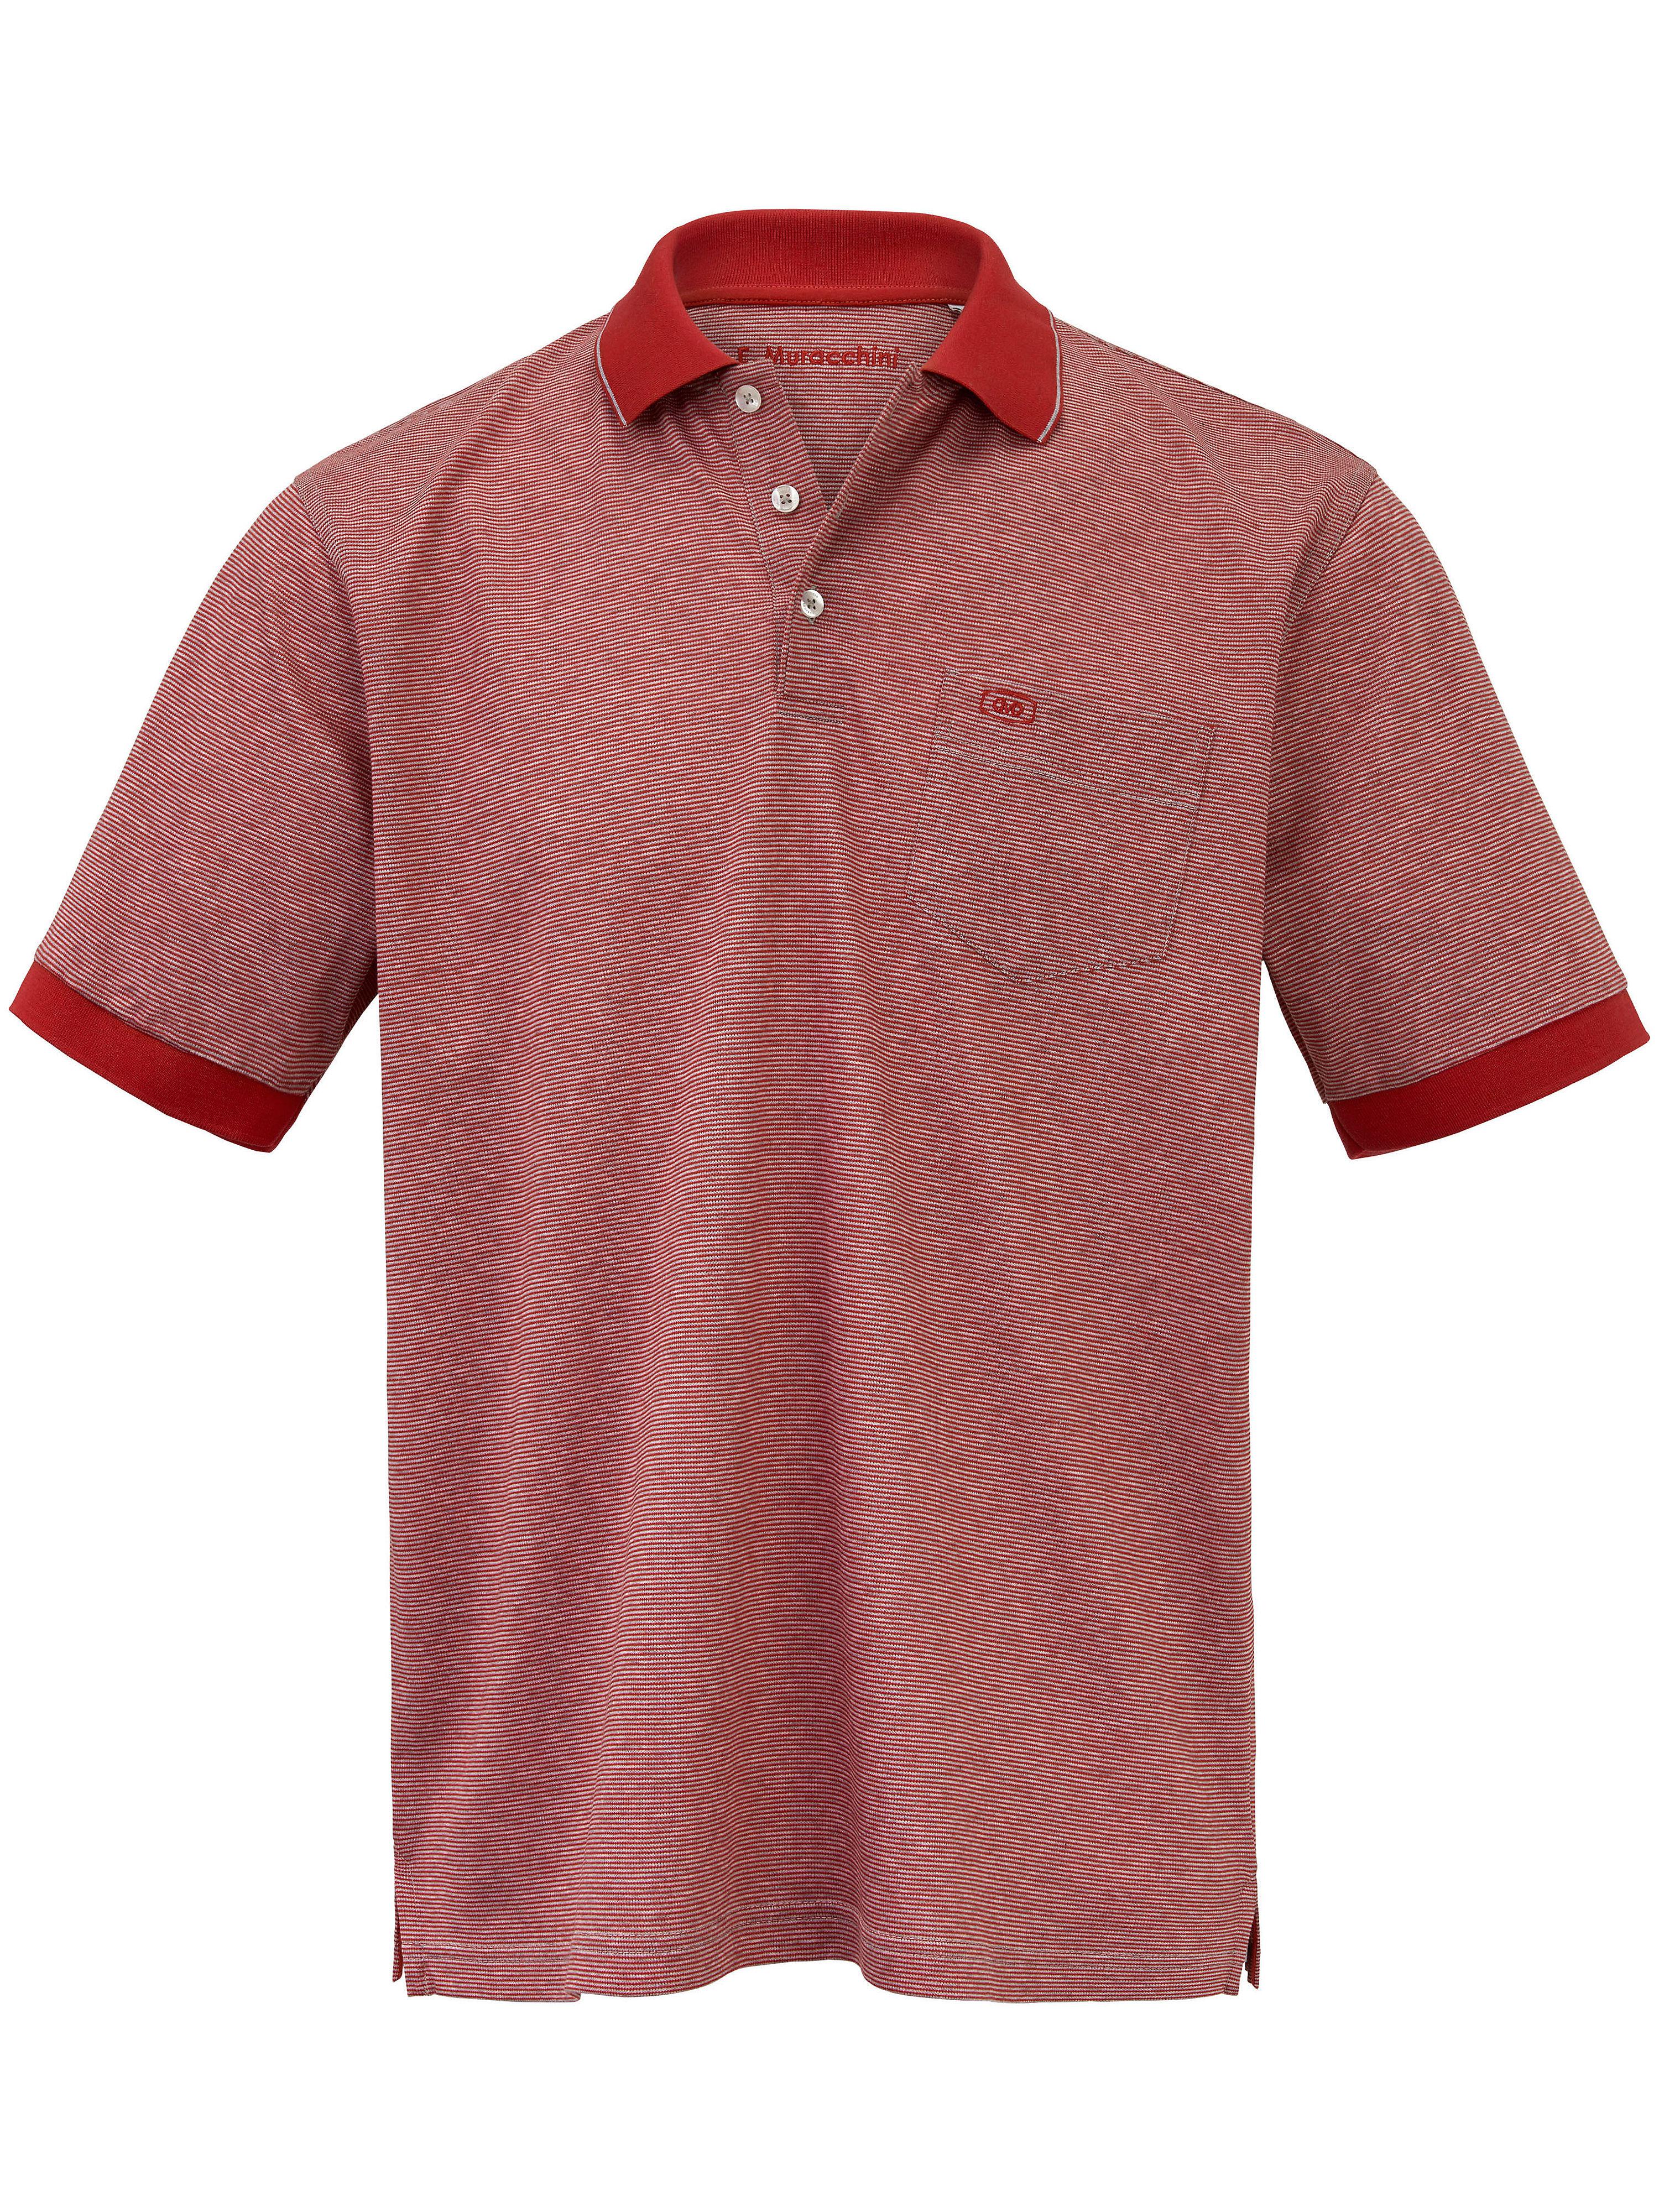 Image of   Poloshirt Fra E.Muracchini rød